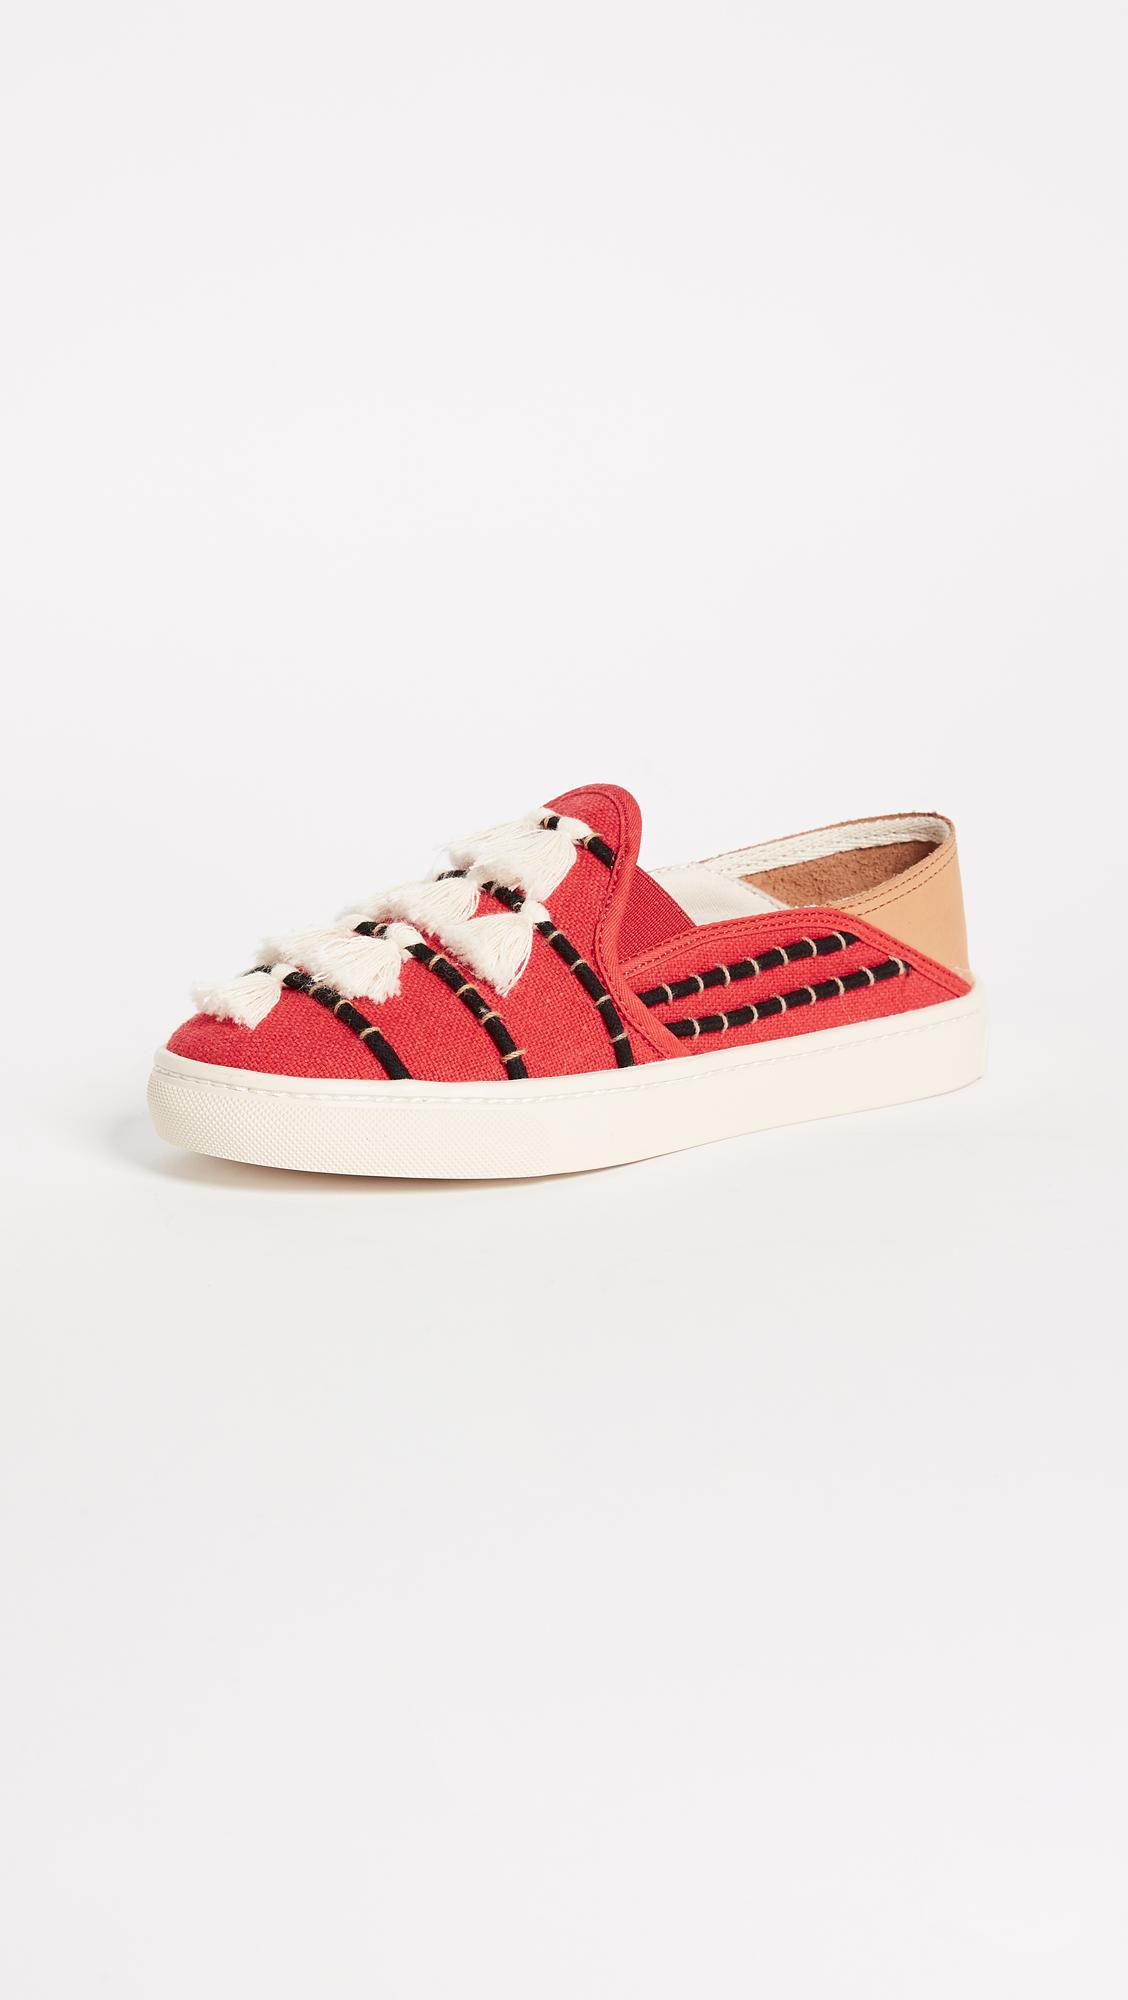 Tassel Slip-On Sneaker Soludos OCWBkw6l